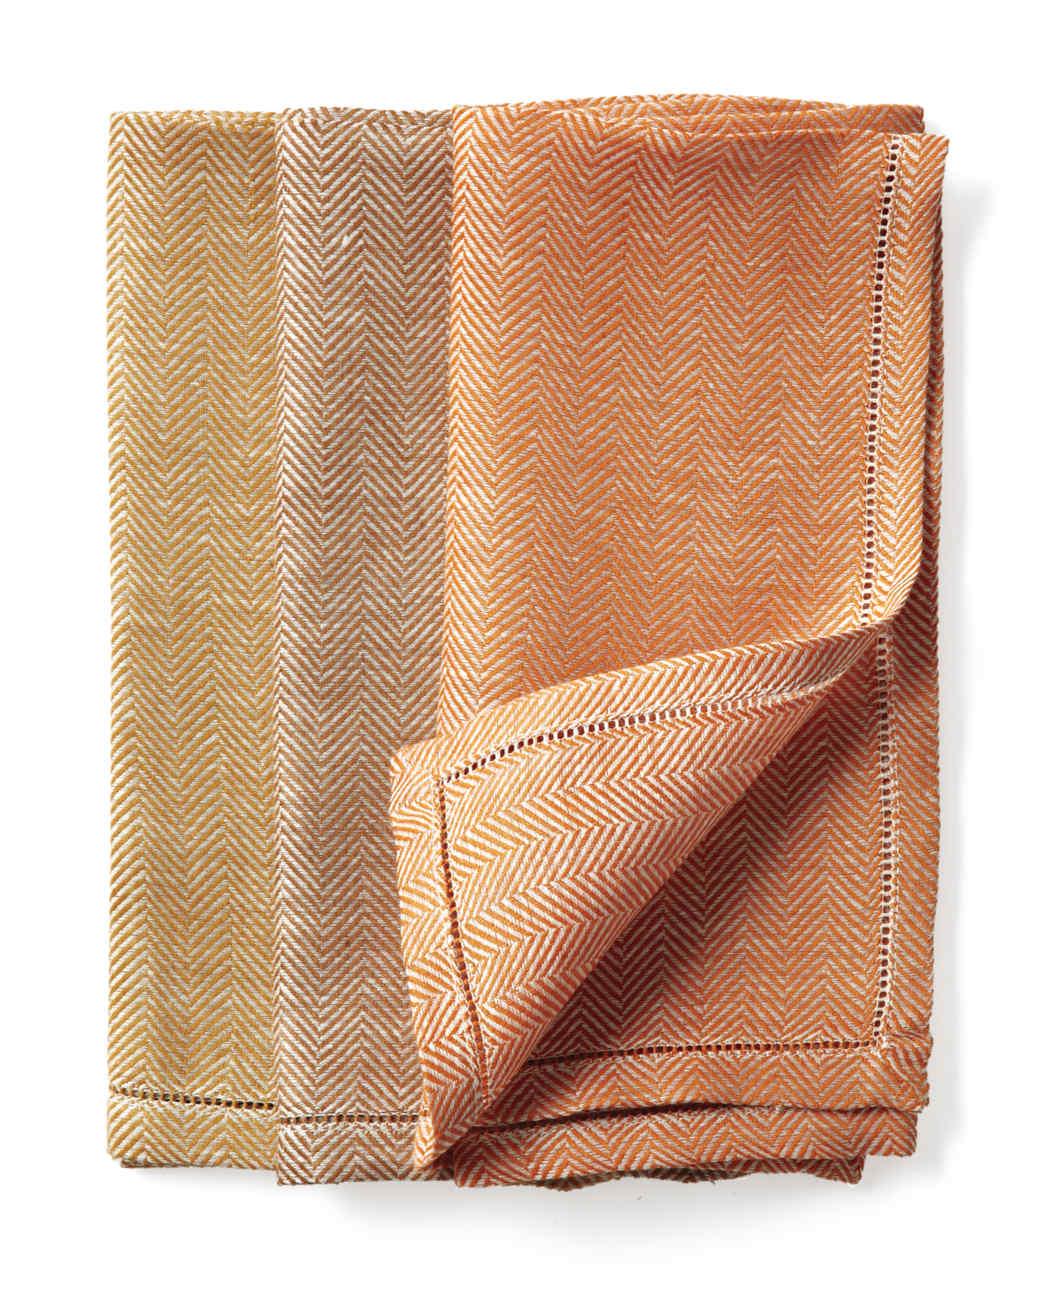 sue-fisher-napkins-mld109068.jpg